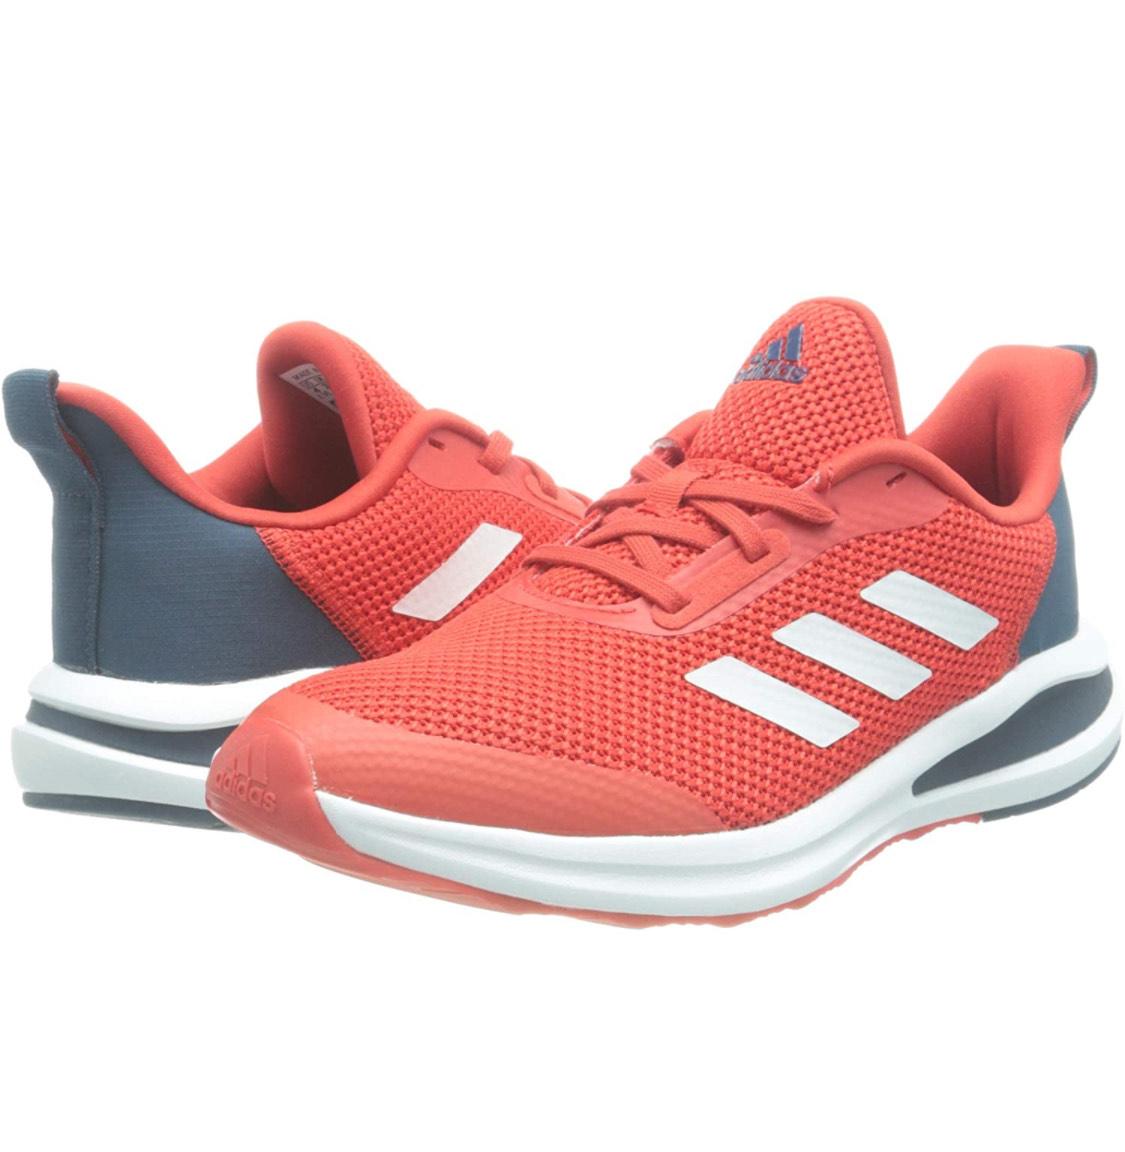 Zapatillas Adidas unisex talla 38.